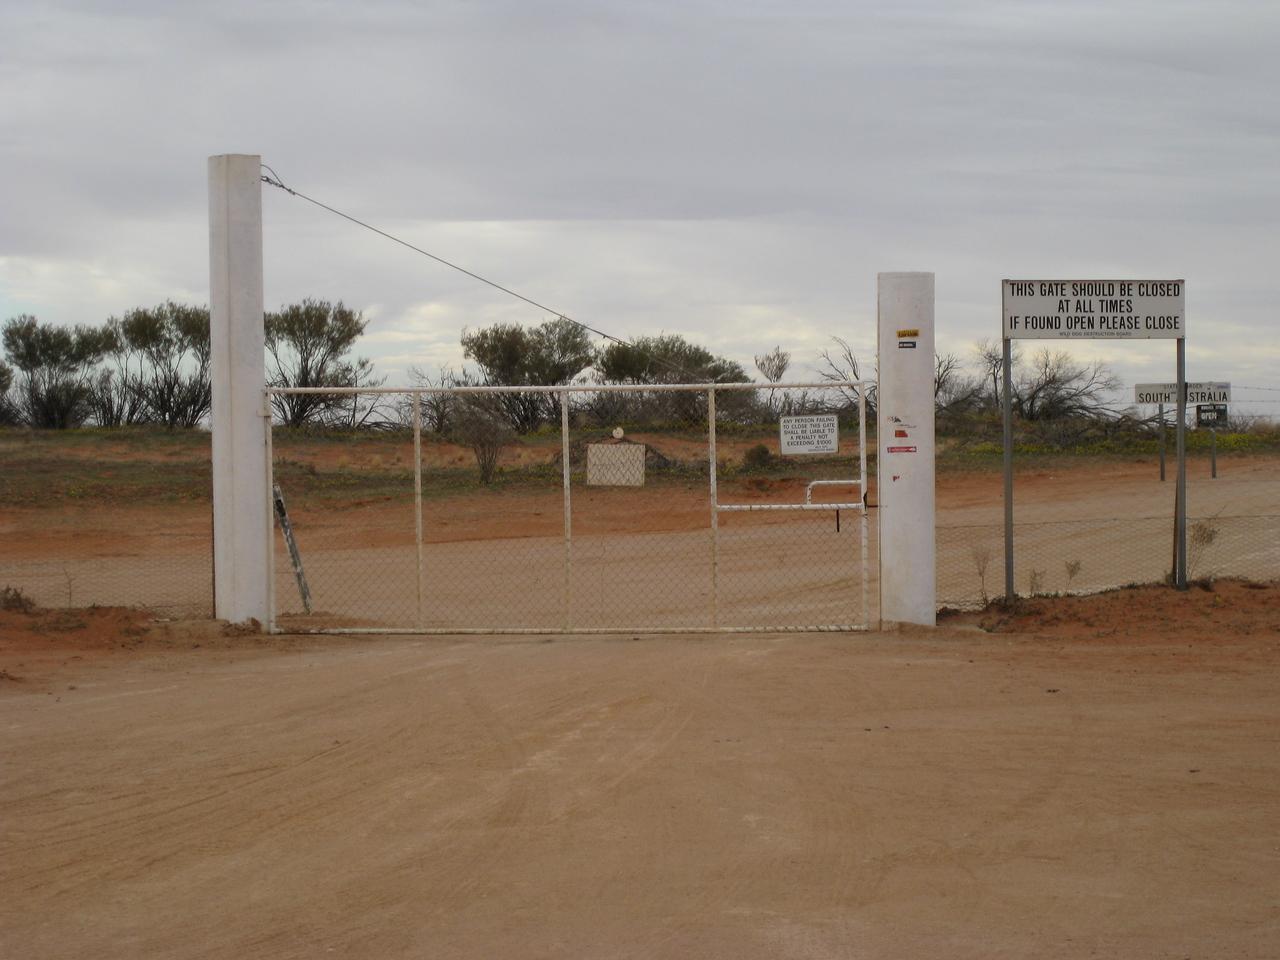 The wild dog gate at Camerons Corner.